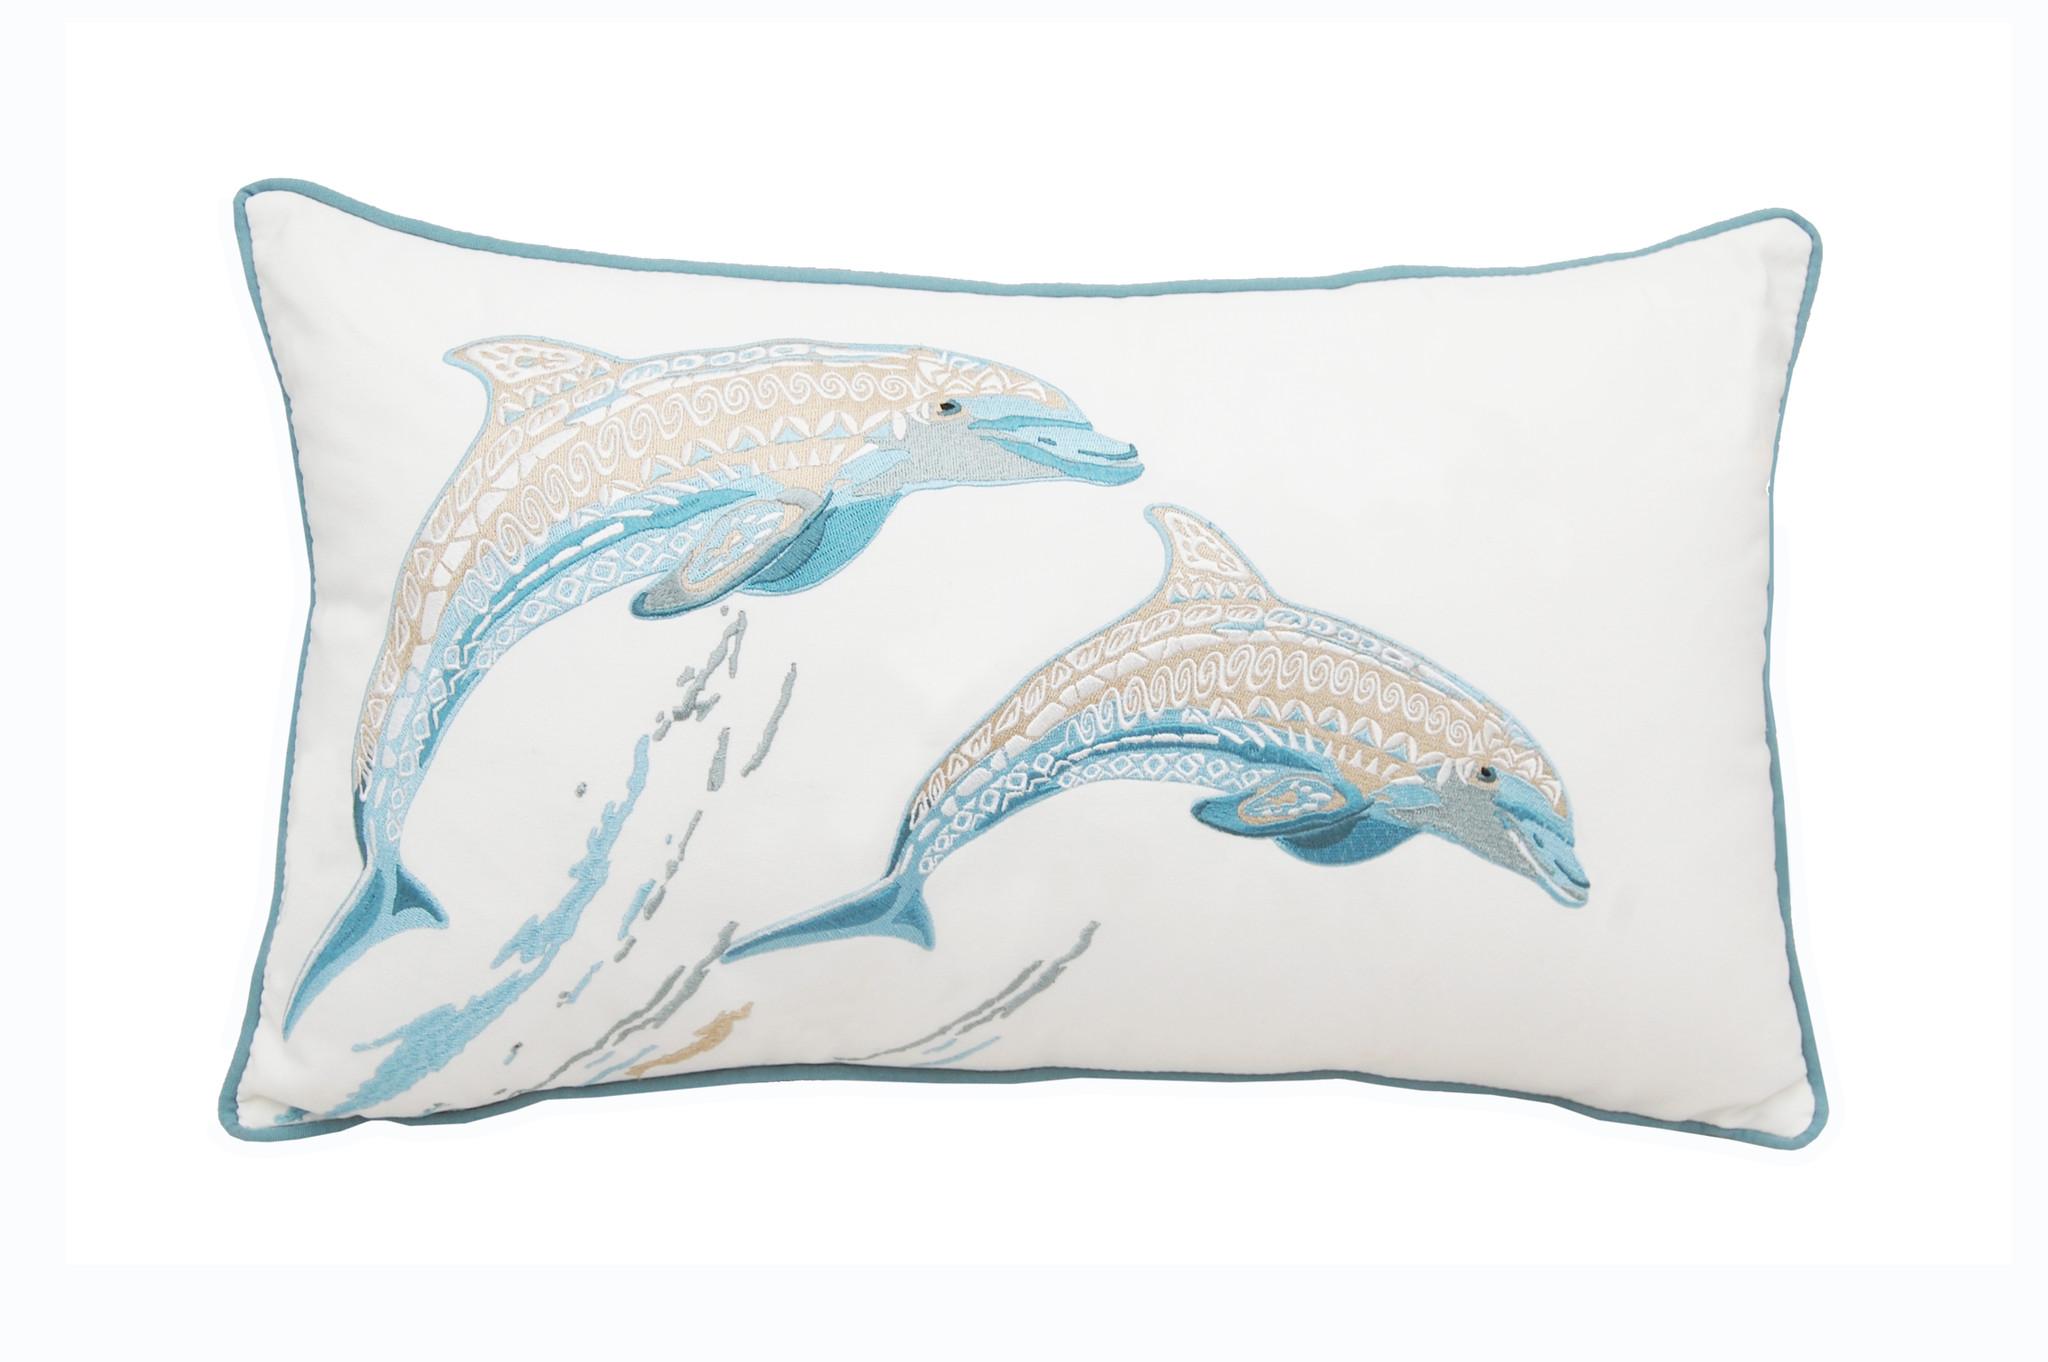 Playful Dolphin Embroidered Lumbar Pillow Caron S Beach House